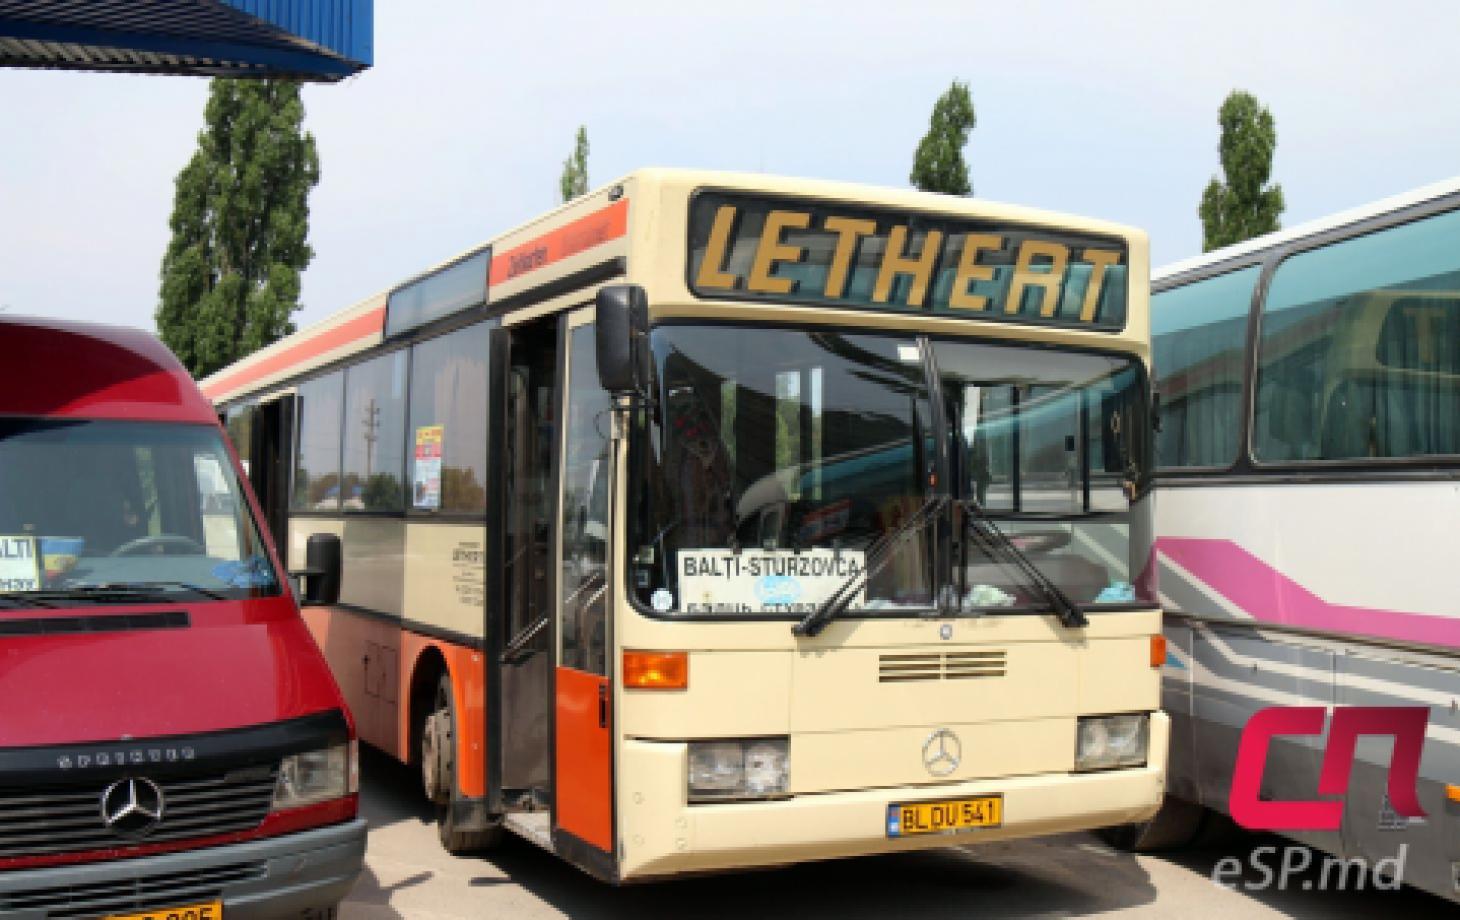 Автобус Бельцы - Стурзовка